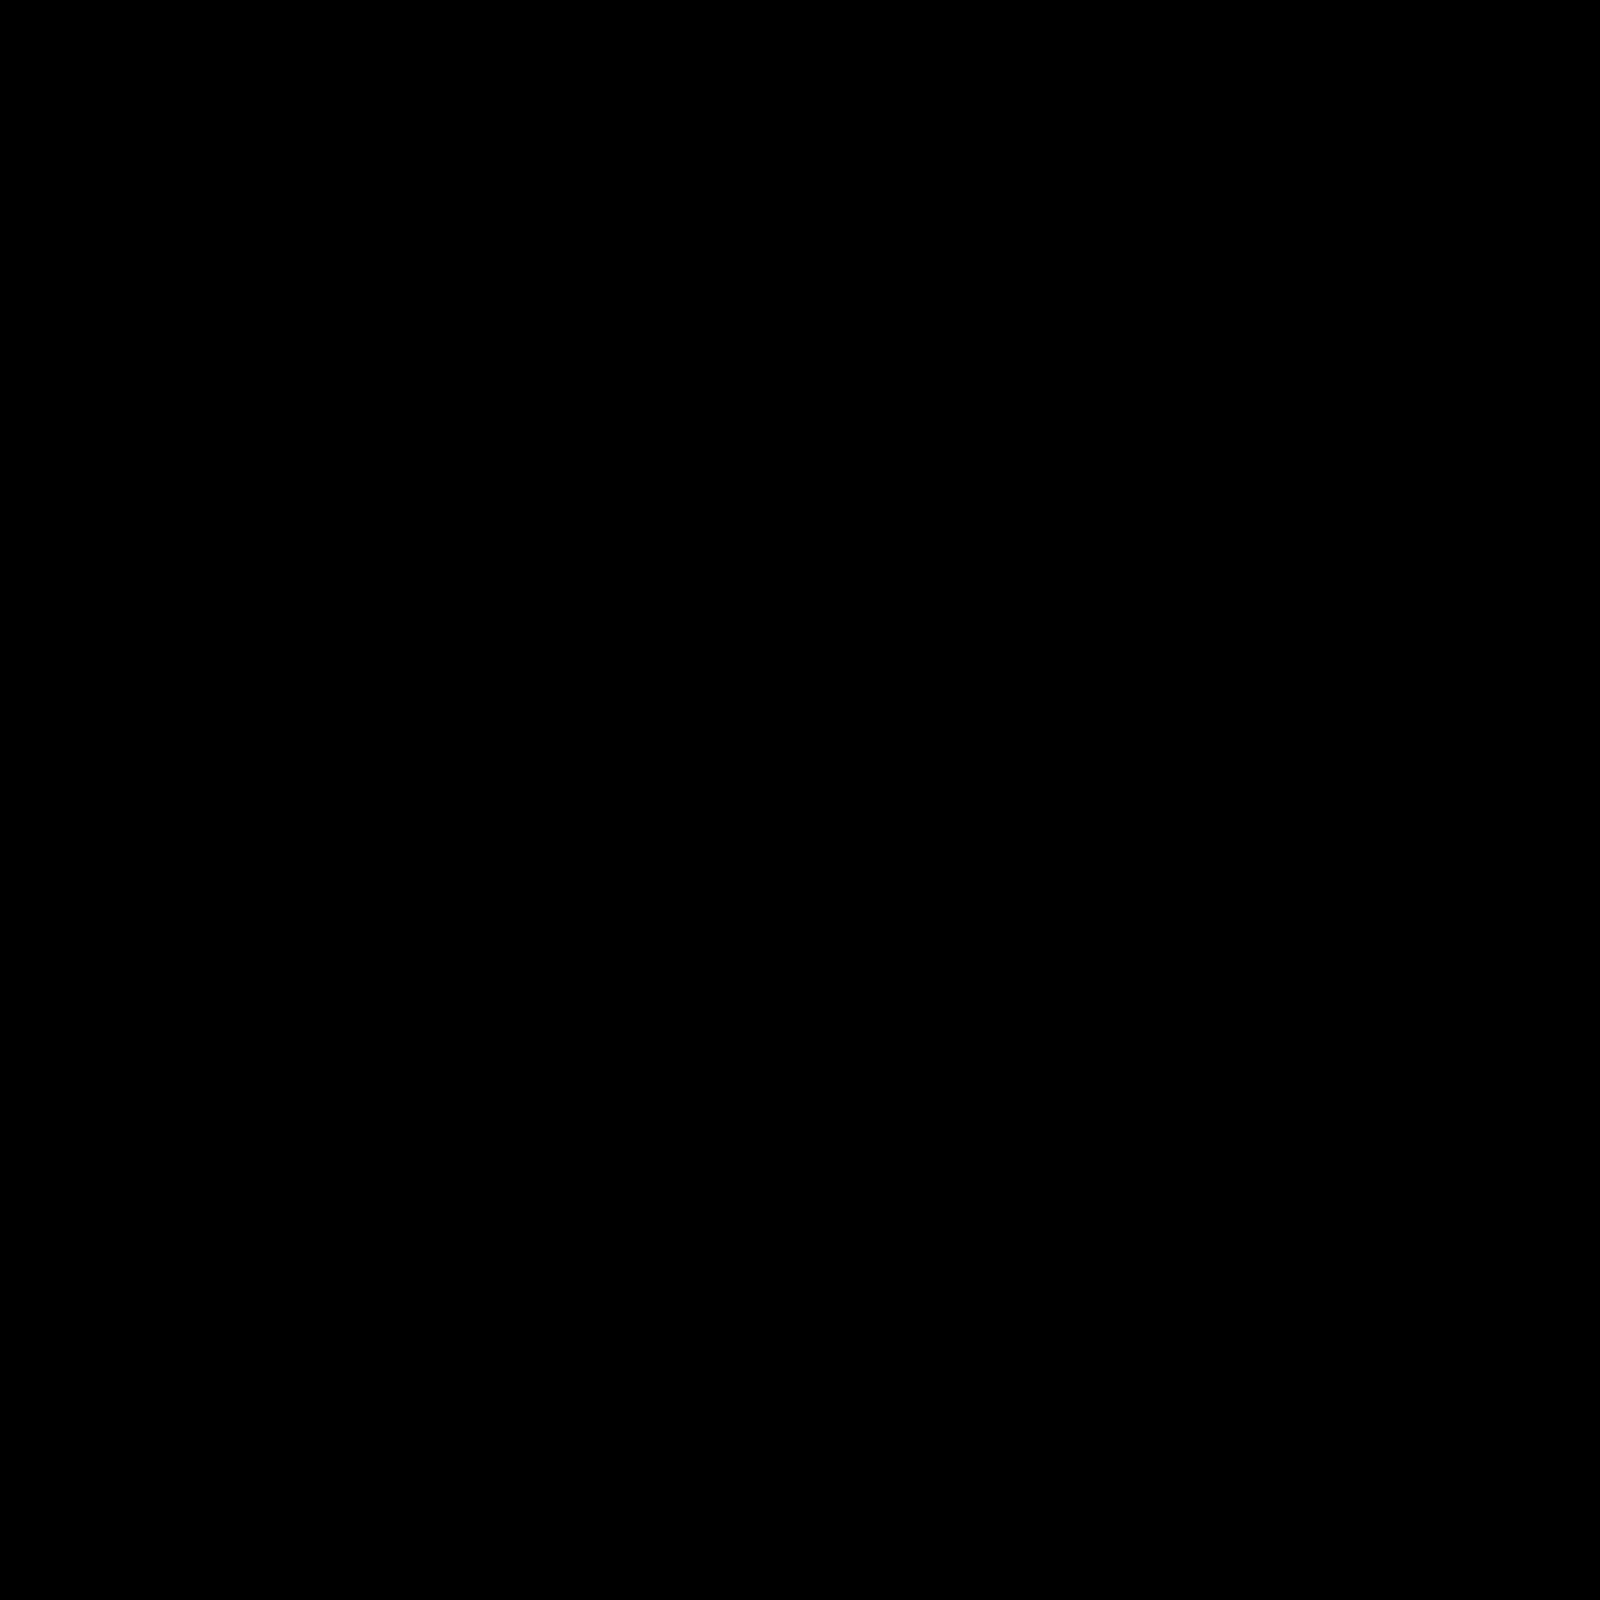 Hug Filled icon